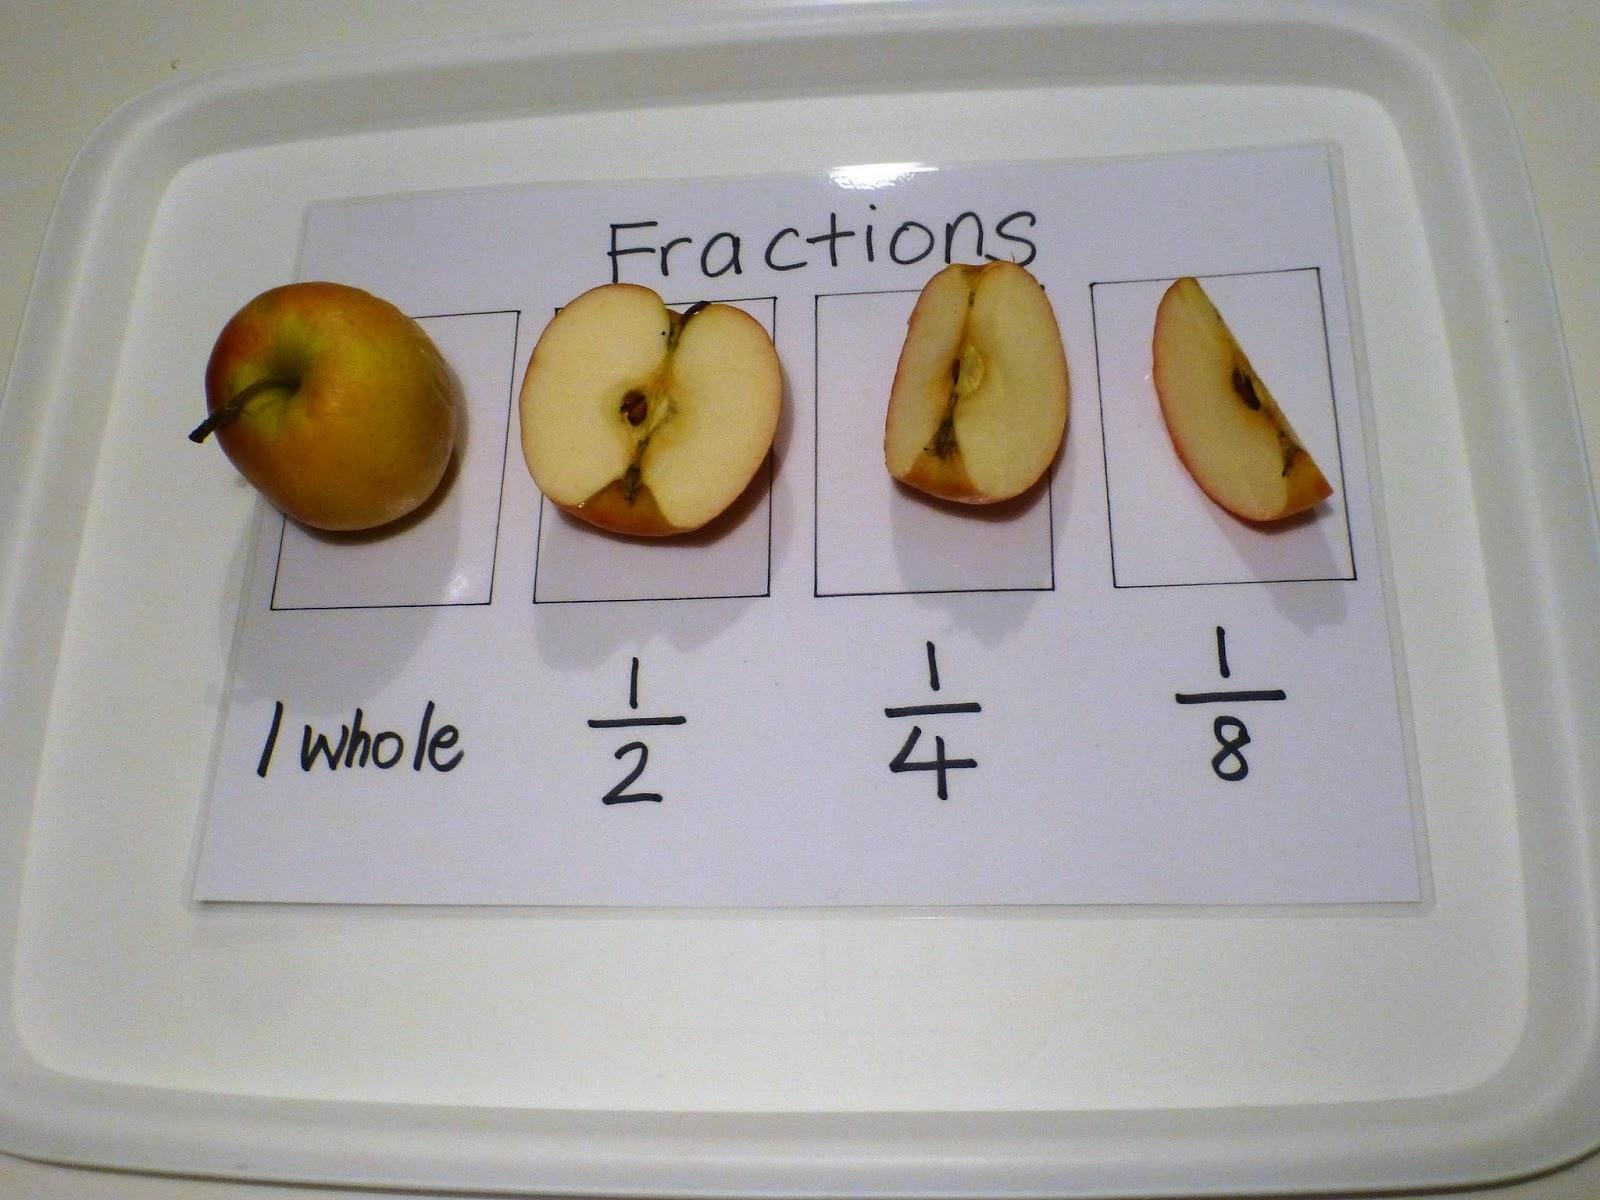 Family Fecs Teaching Fractions With An Apple